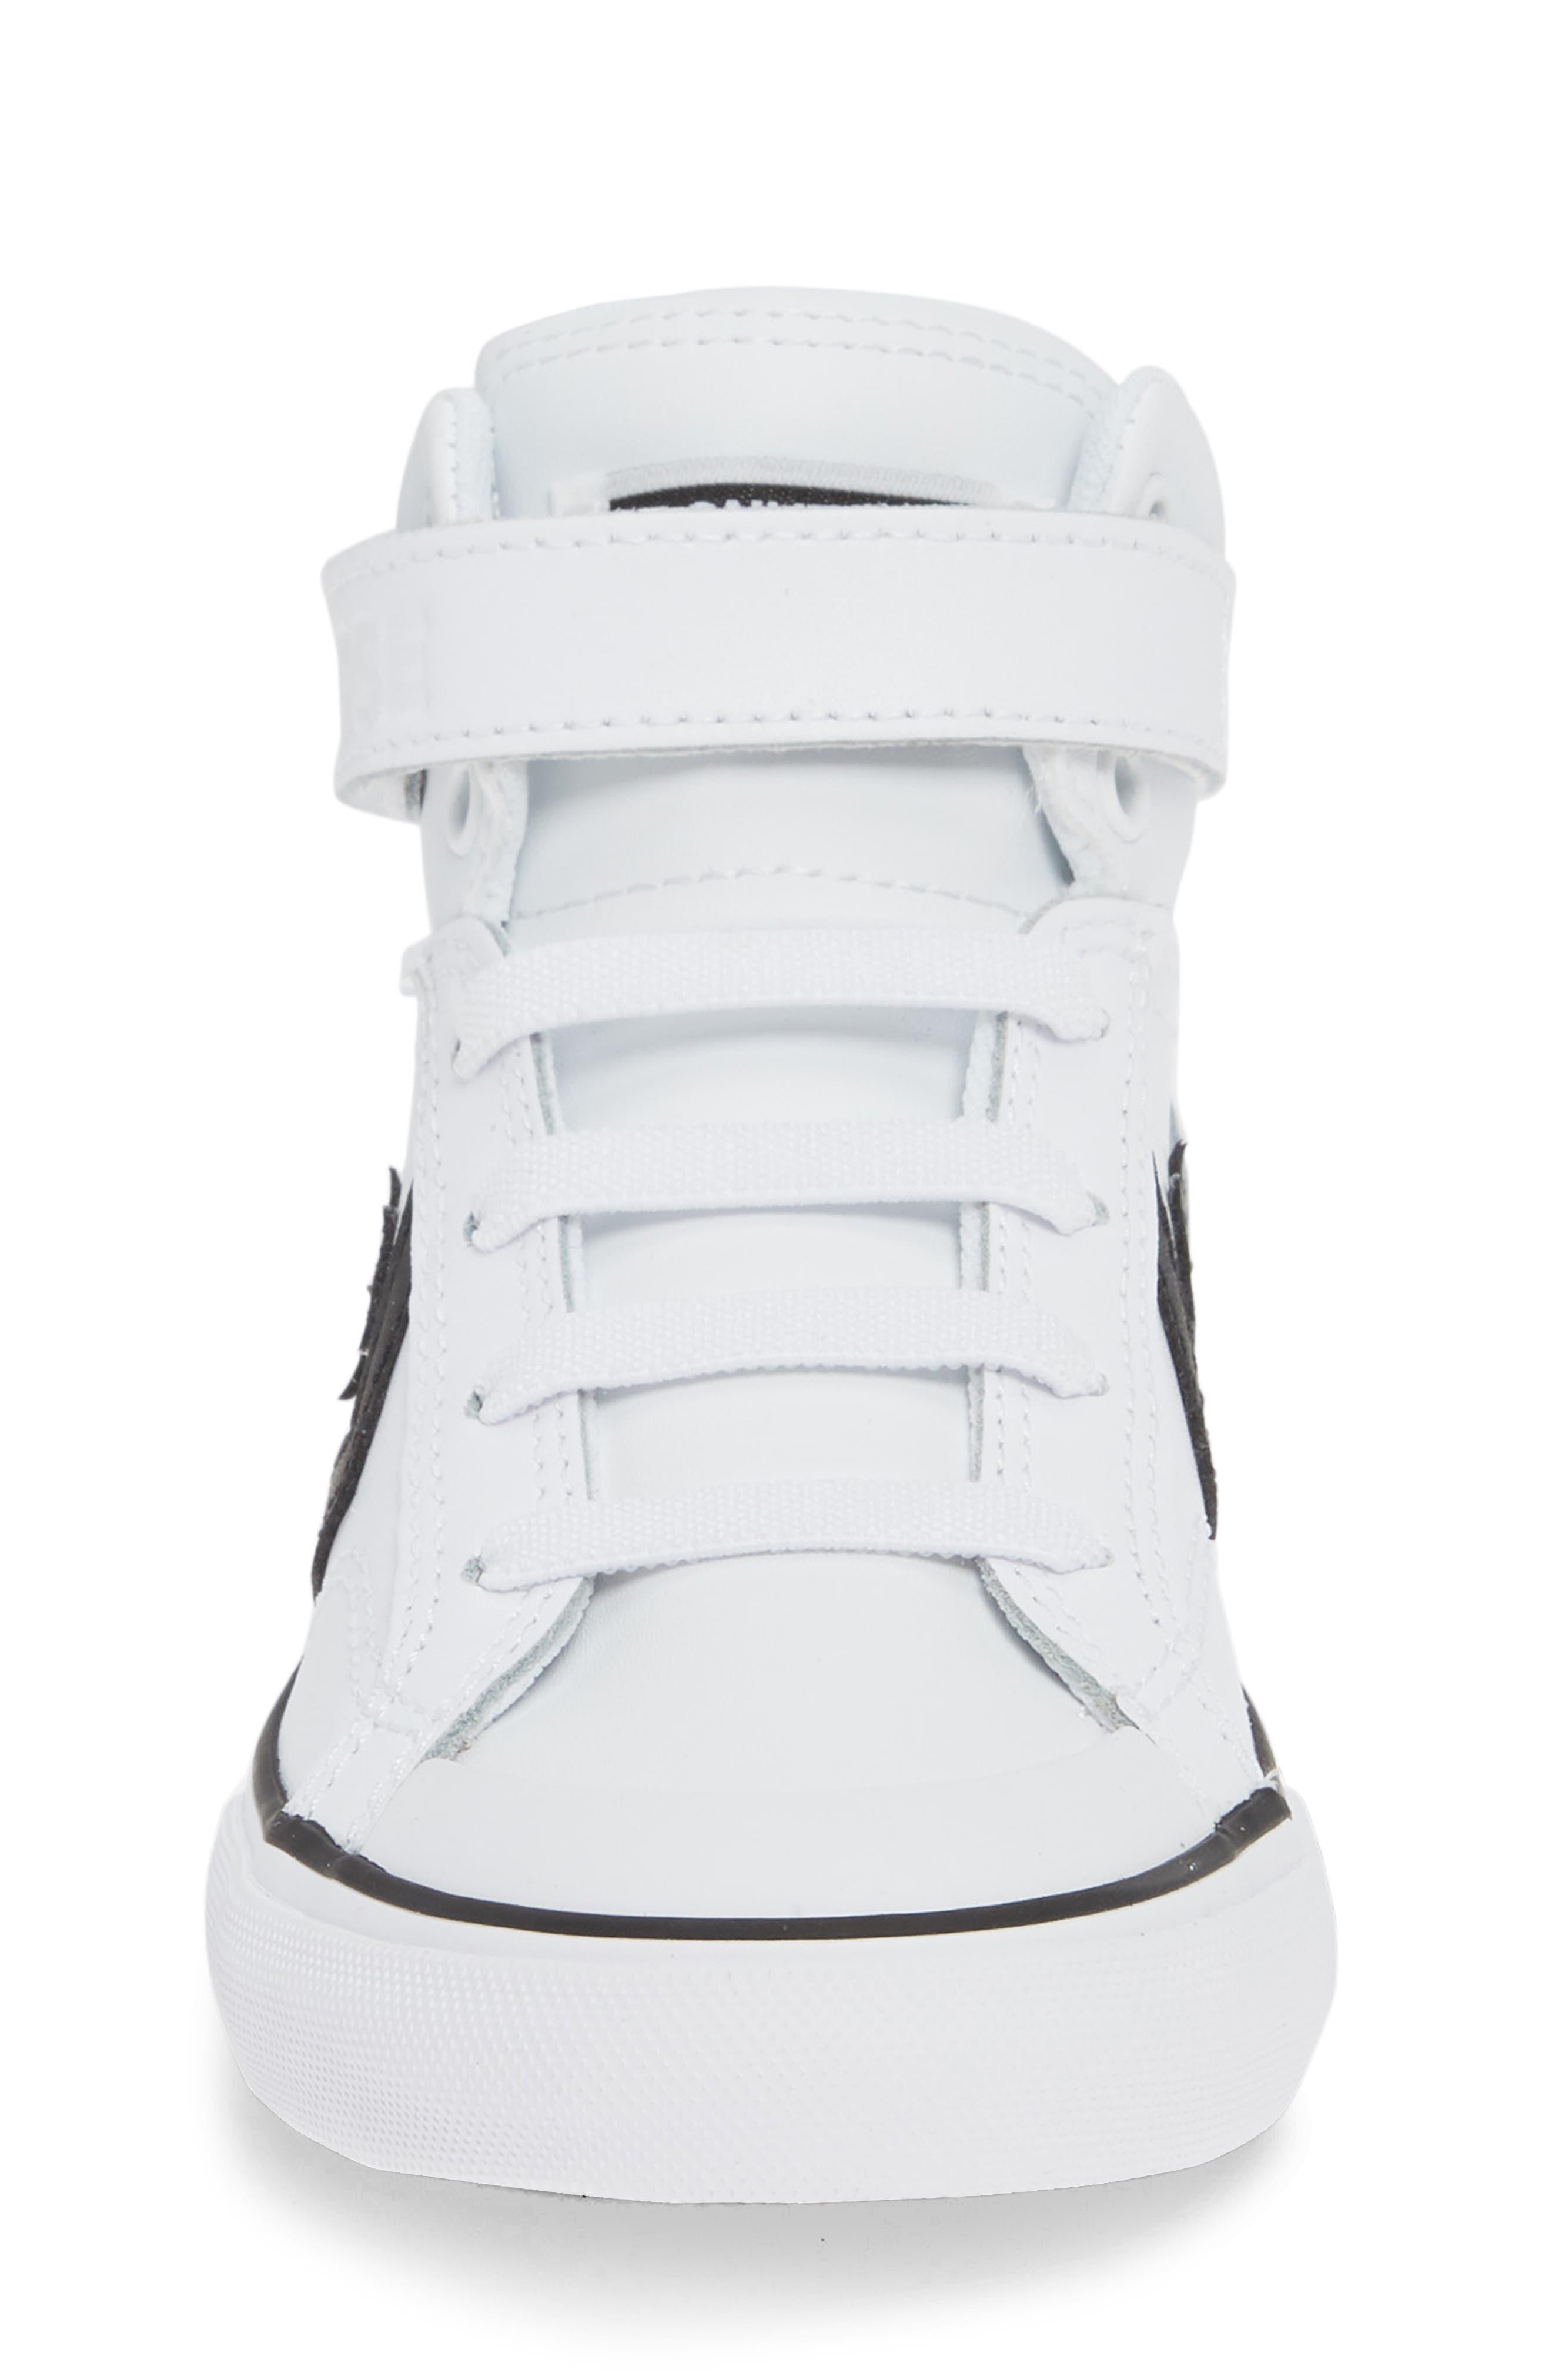 Pro Blaze High Top Sneaker,                             Alternate thumbnail 4, color,                             102